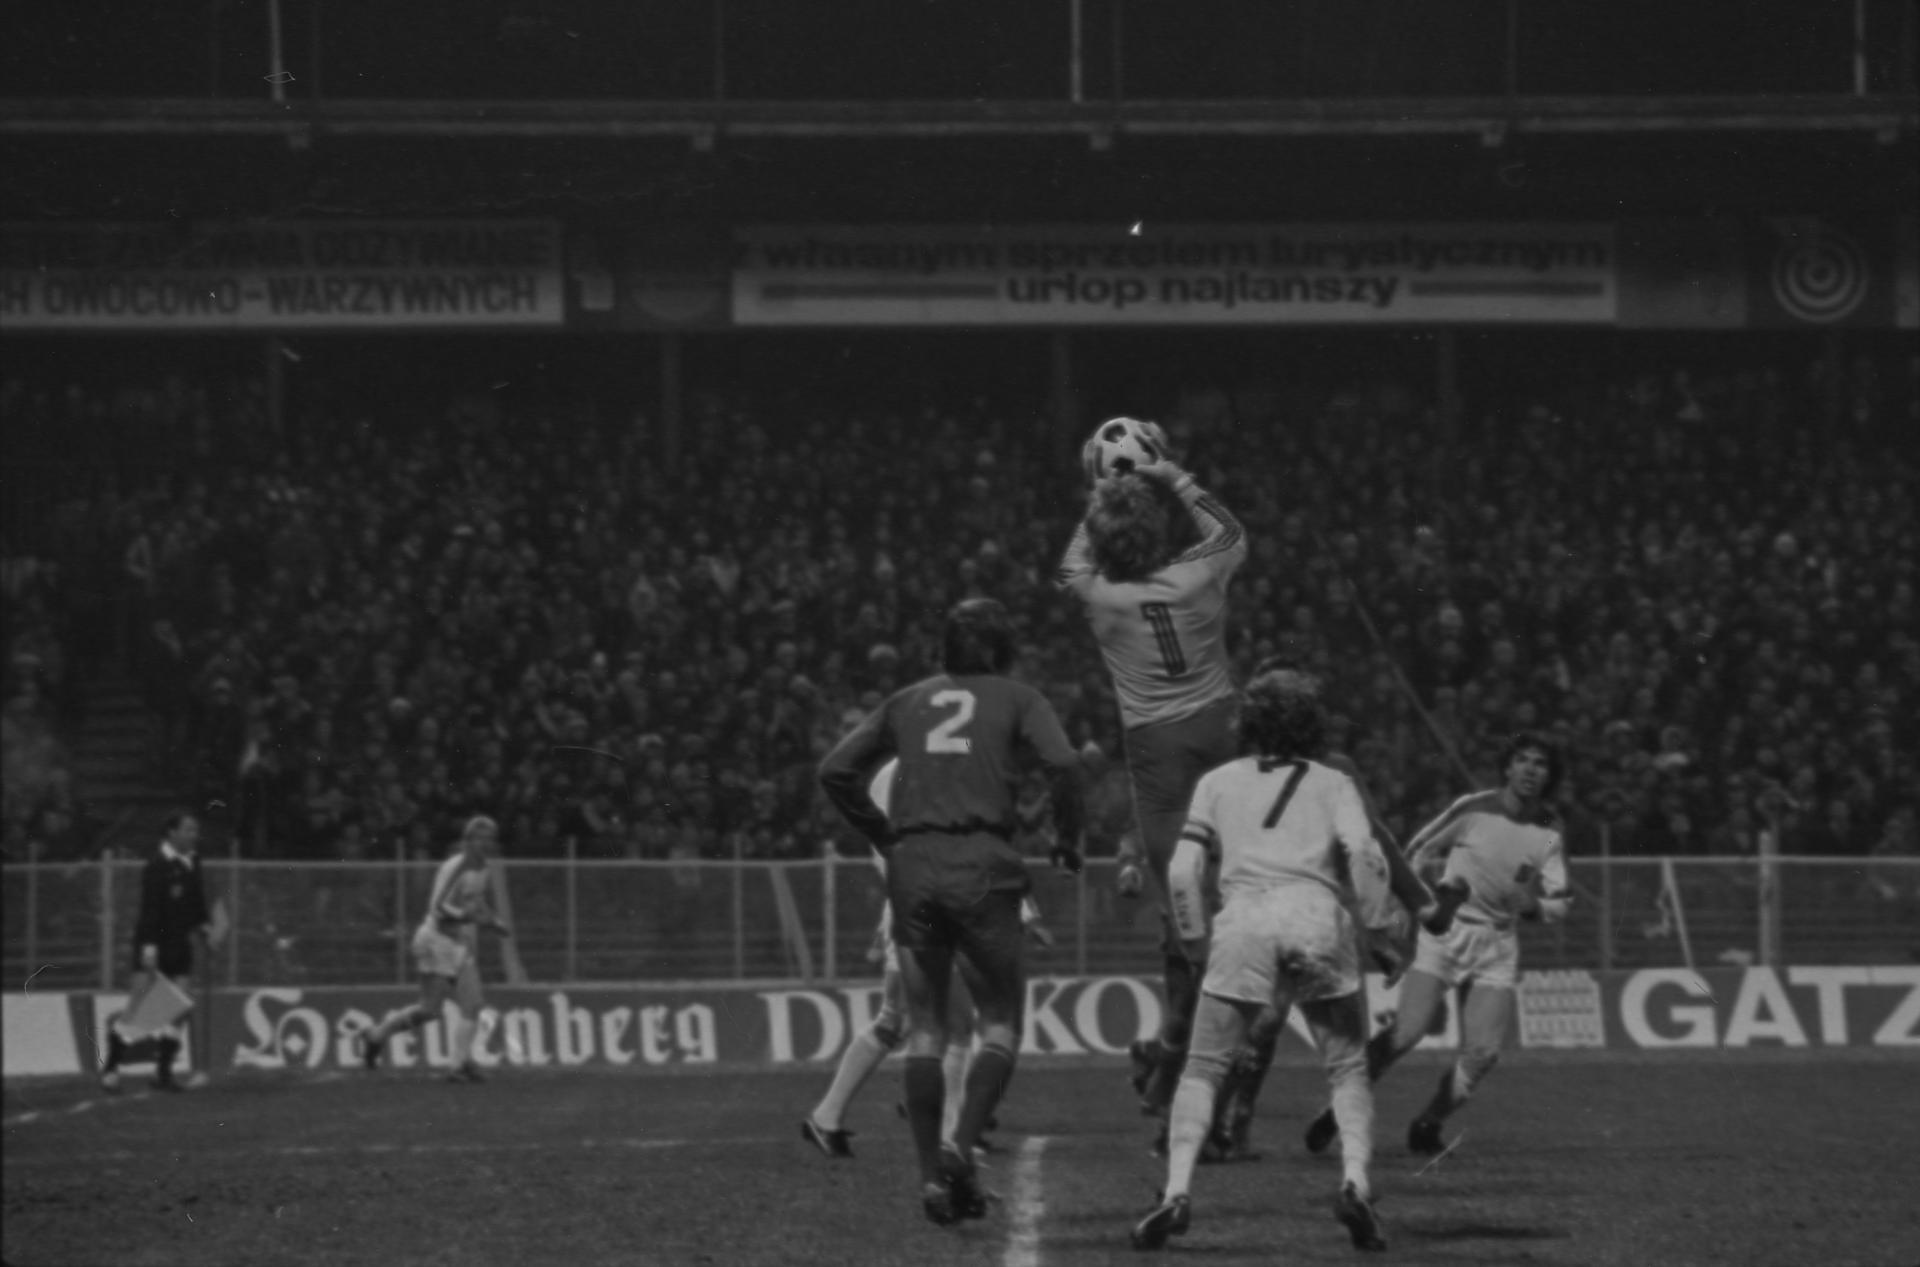 Śląsk Wrocław - Borussia Mönchengladbach 2:4 (06.12.1978)